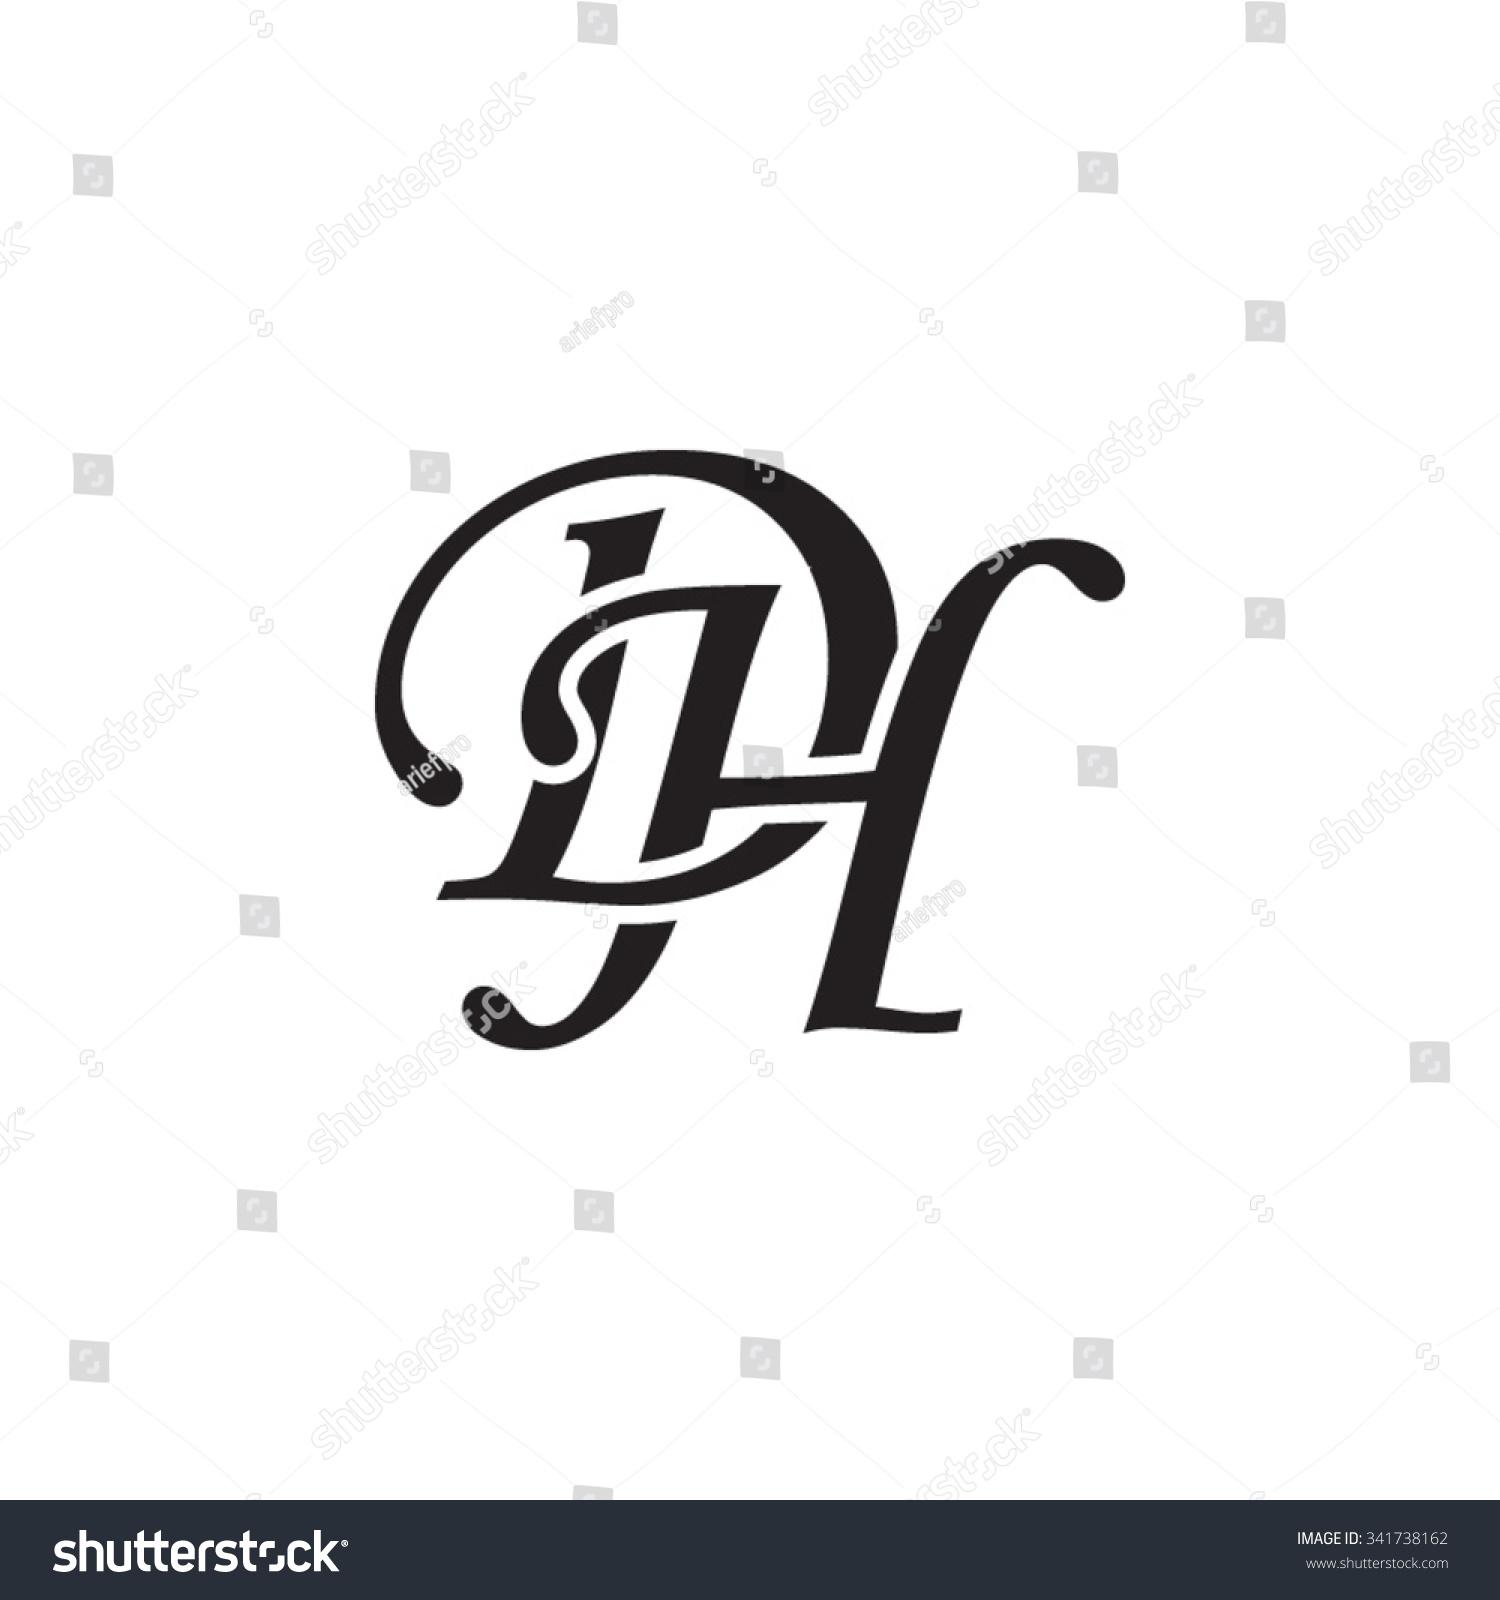 Dh Initial Monogram Logo Stock Vector Illustration